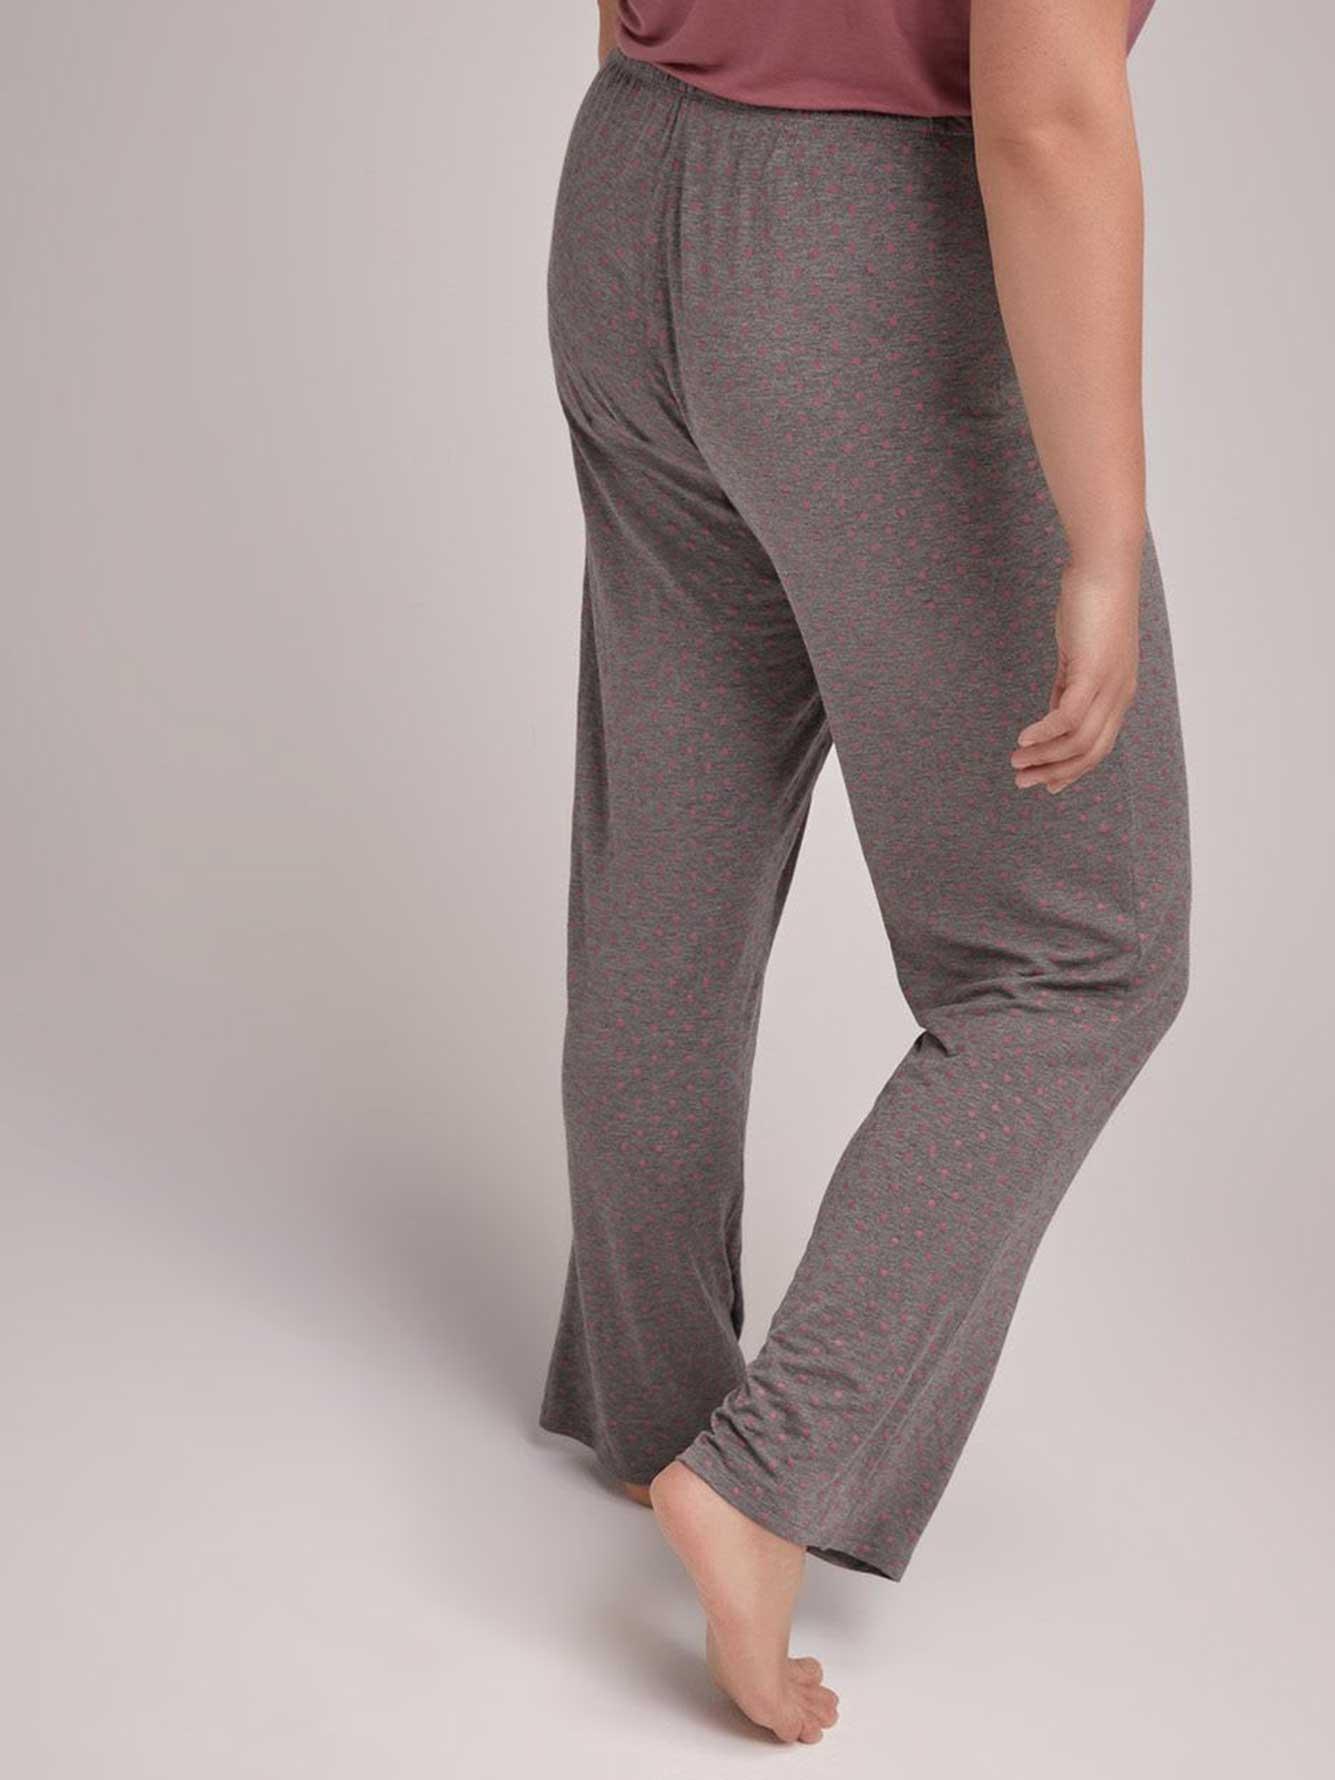 Straight Pajama Pant - Déesse Collection  03c15ec5b